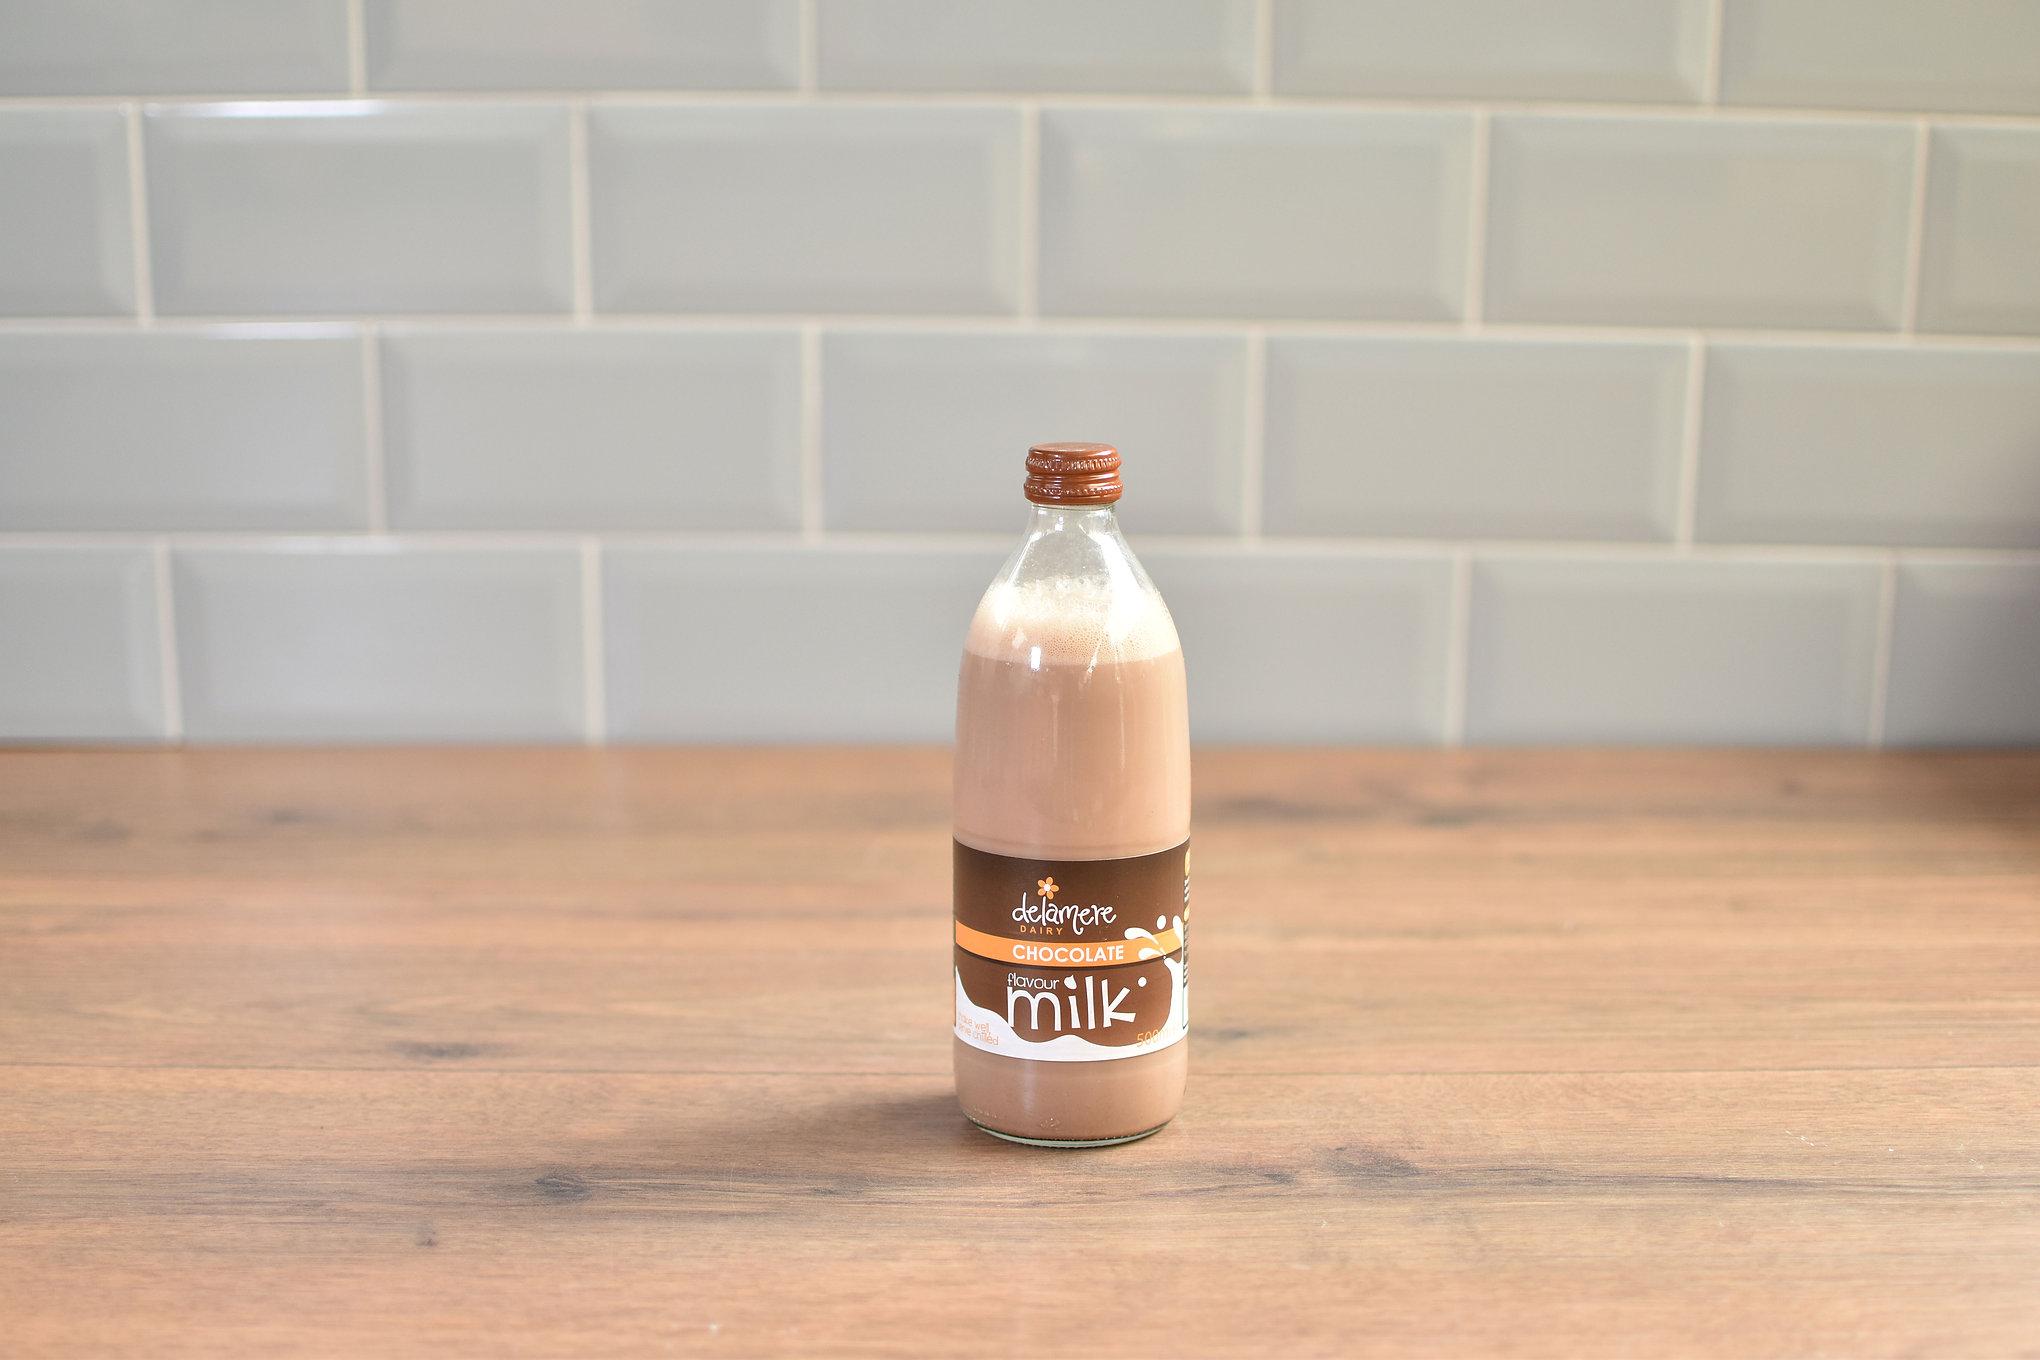 Delamere Chocolate Milk - 500ml Glass Bottle